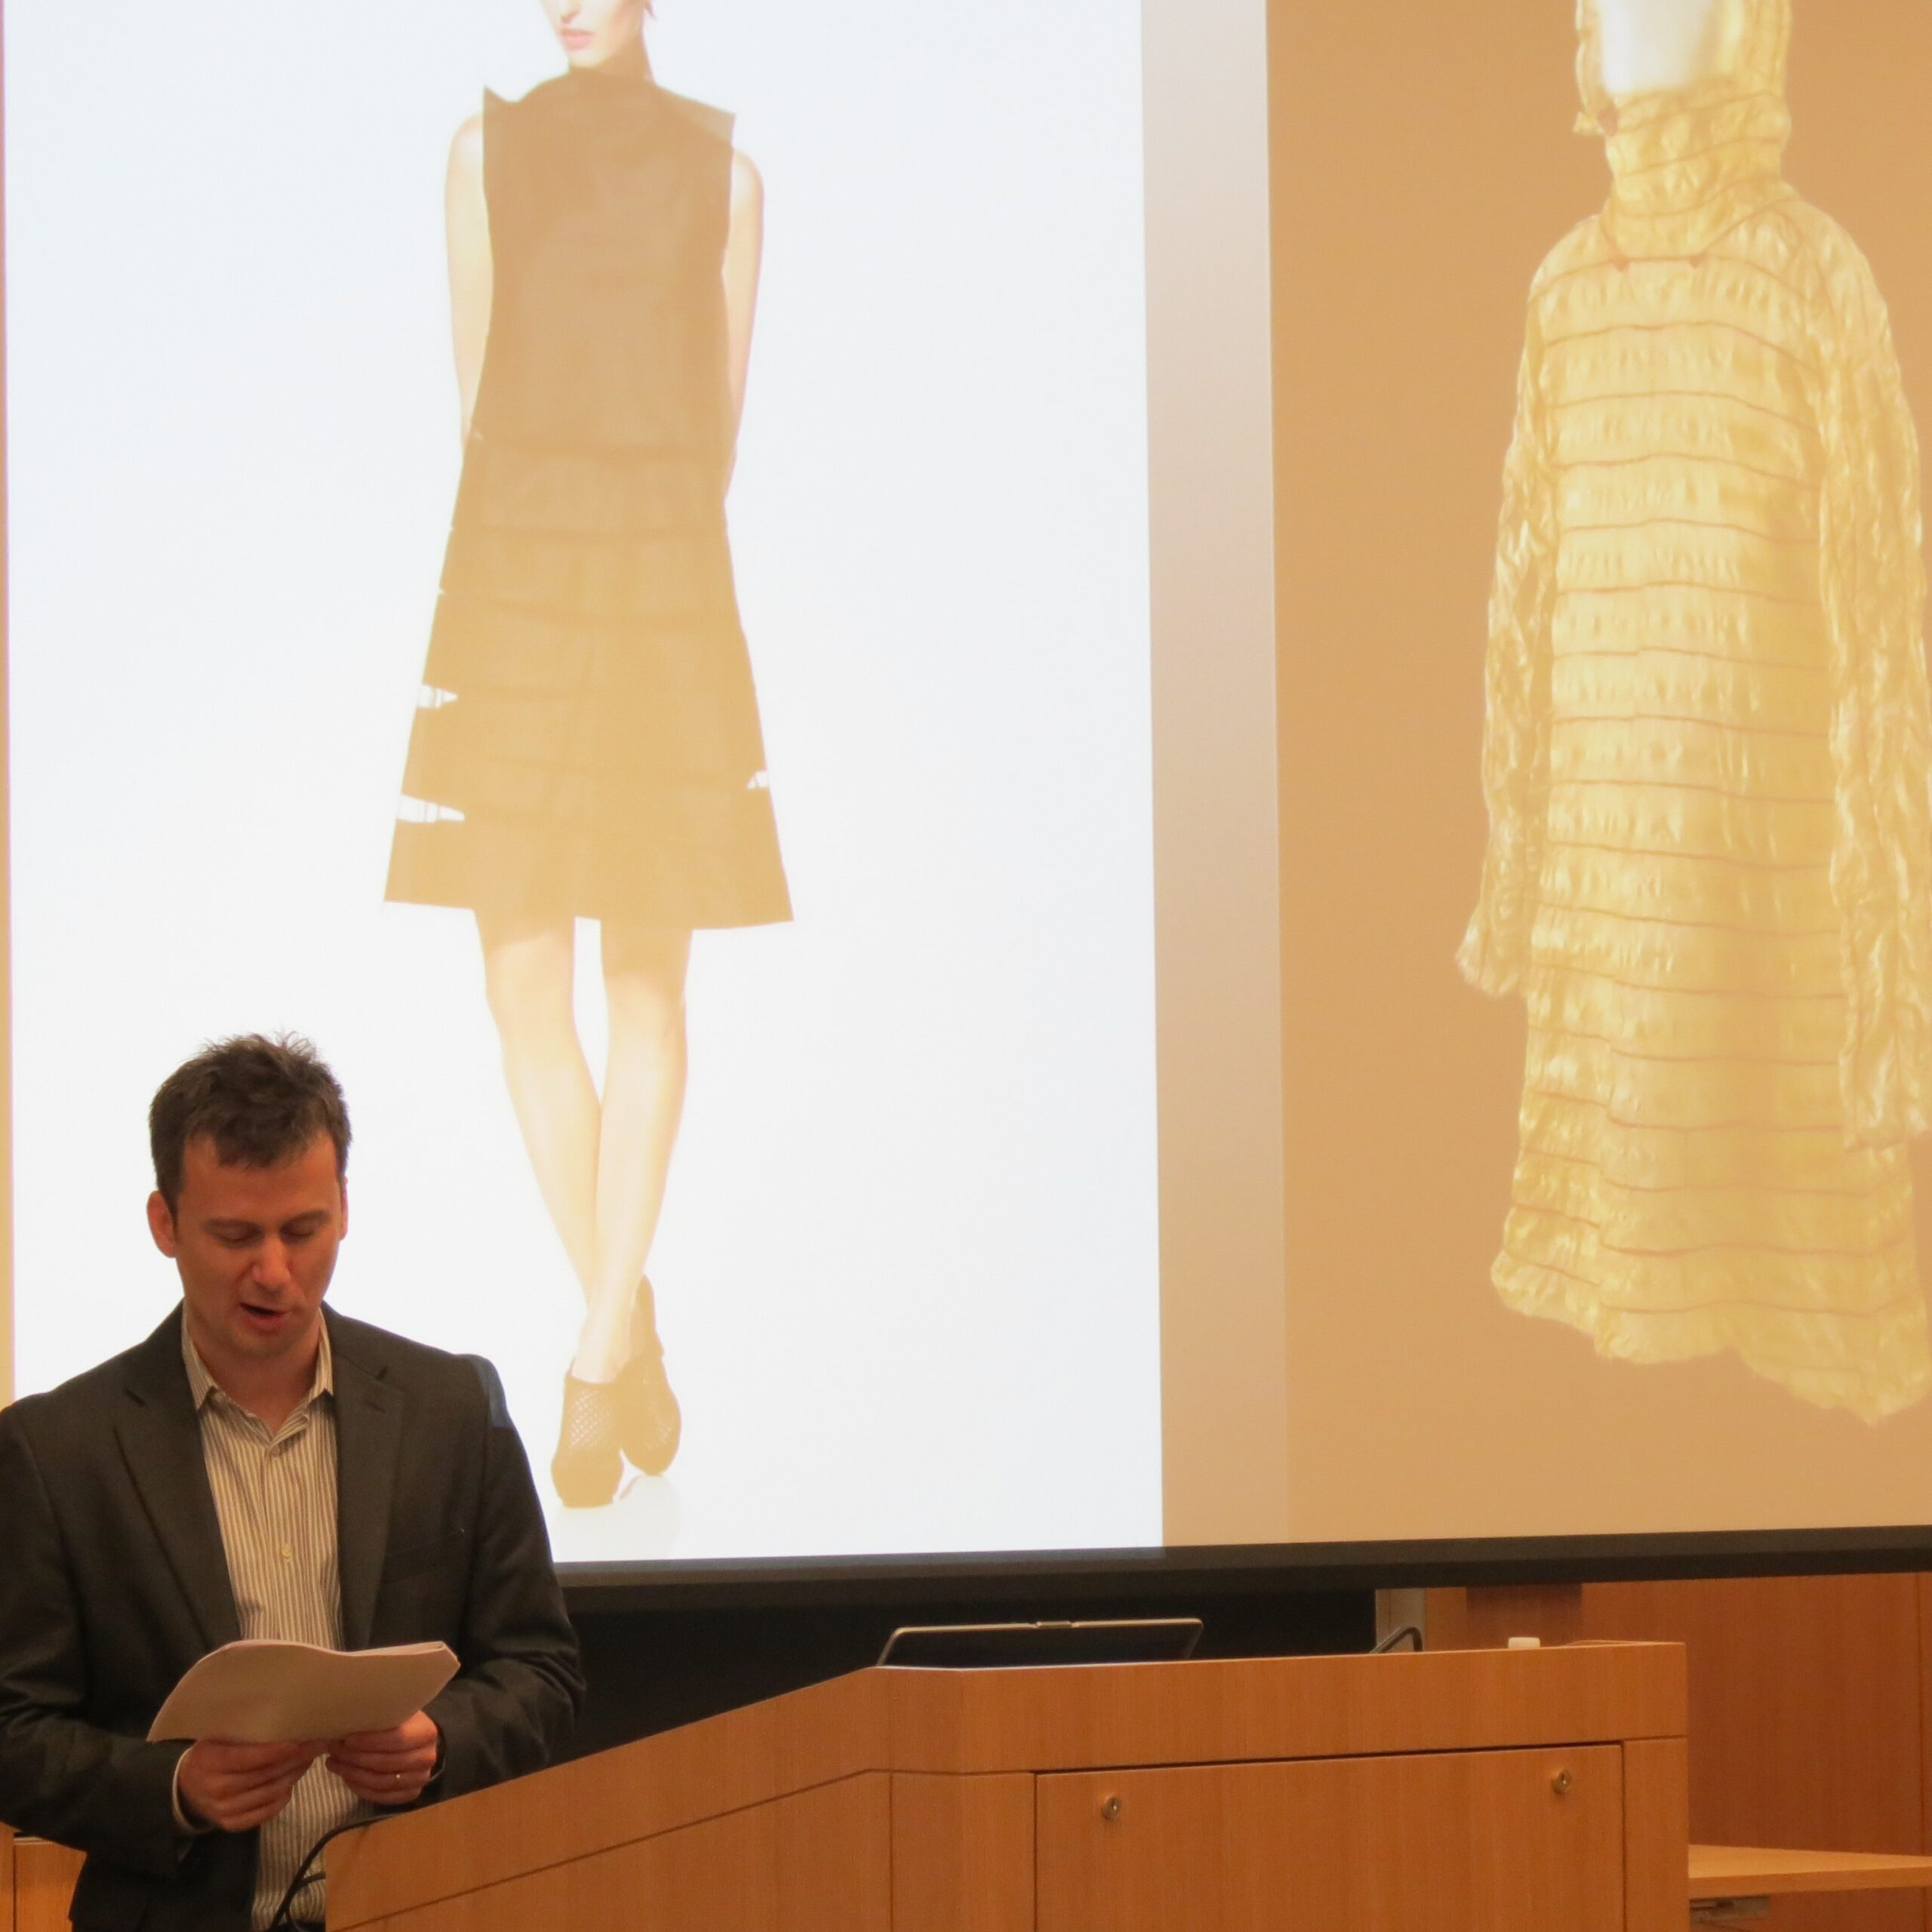 speaker reading aloud in front of slide of two dresses on mannequins